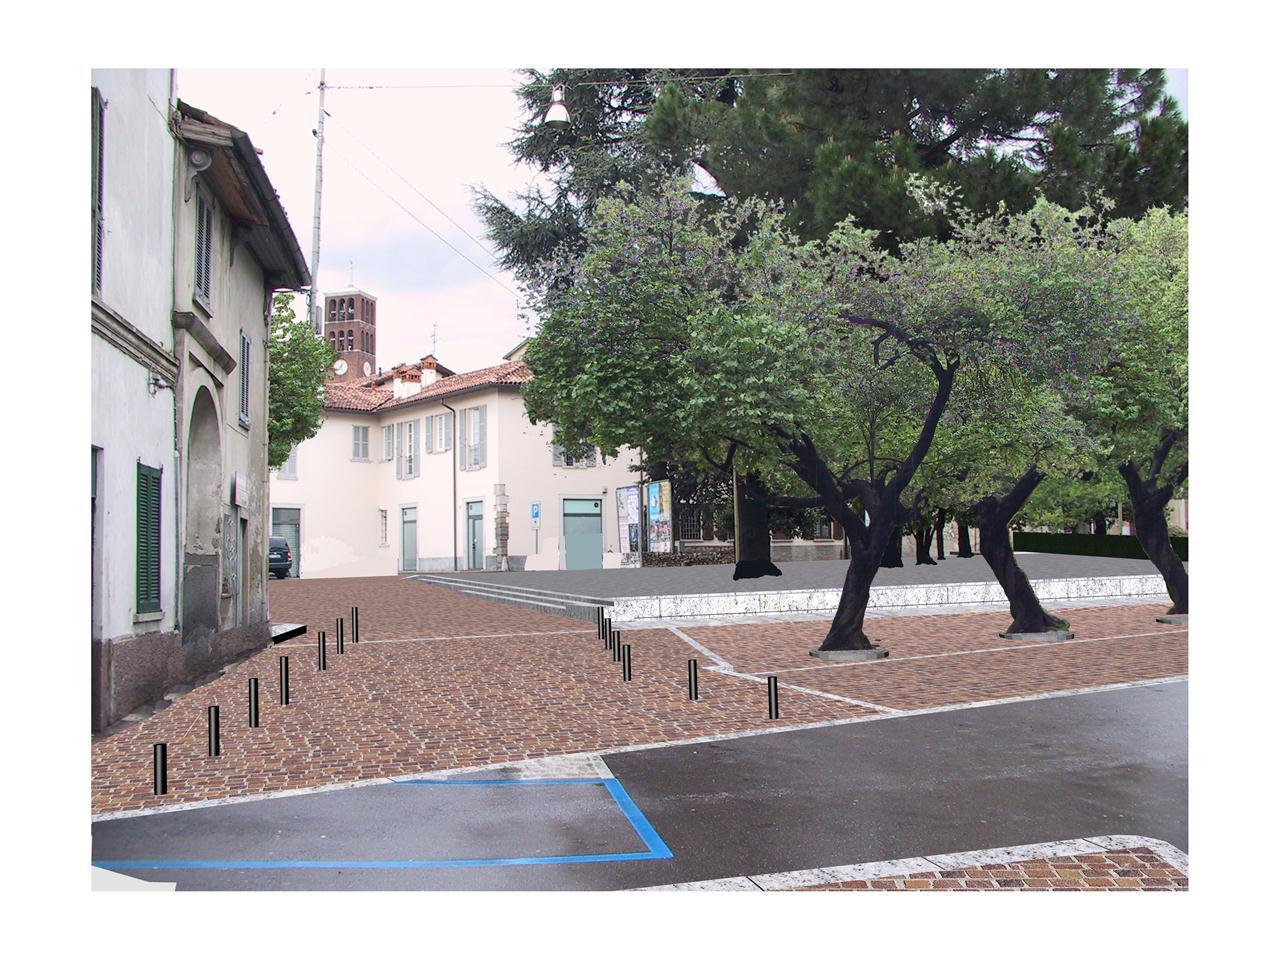 http://www.antoniolazzaretto.it/wp-content/uploads/2013/10/4-stampa1.jpg